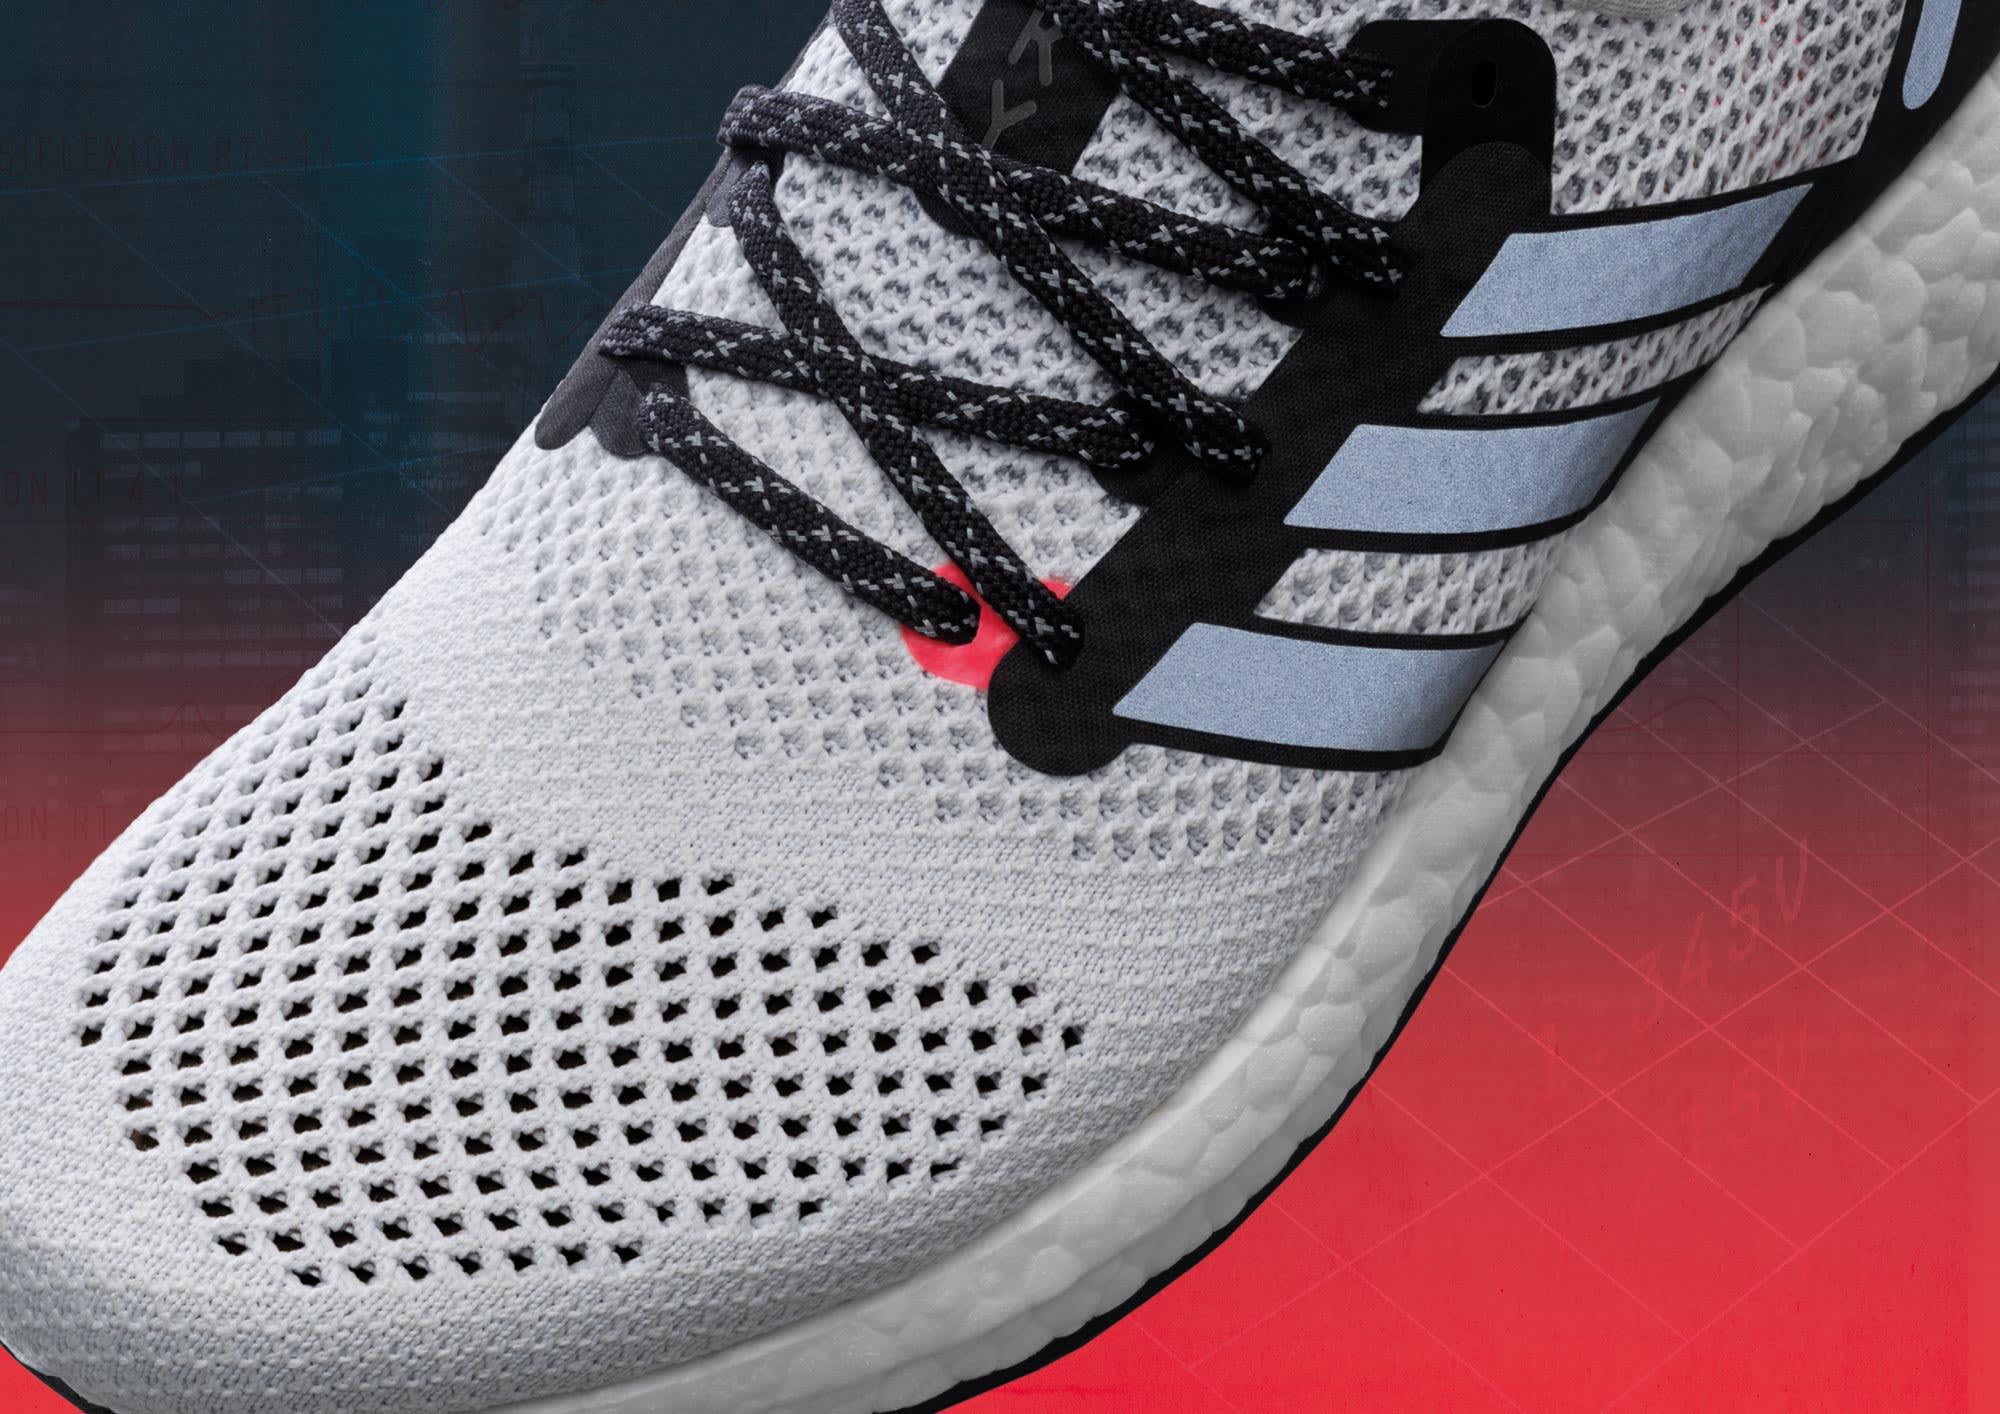 Adidas Speedfactory AM4TKY (Detail)